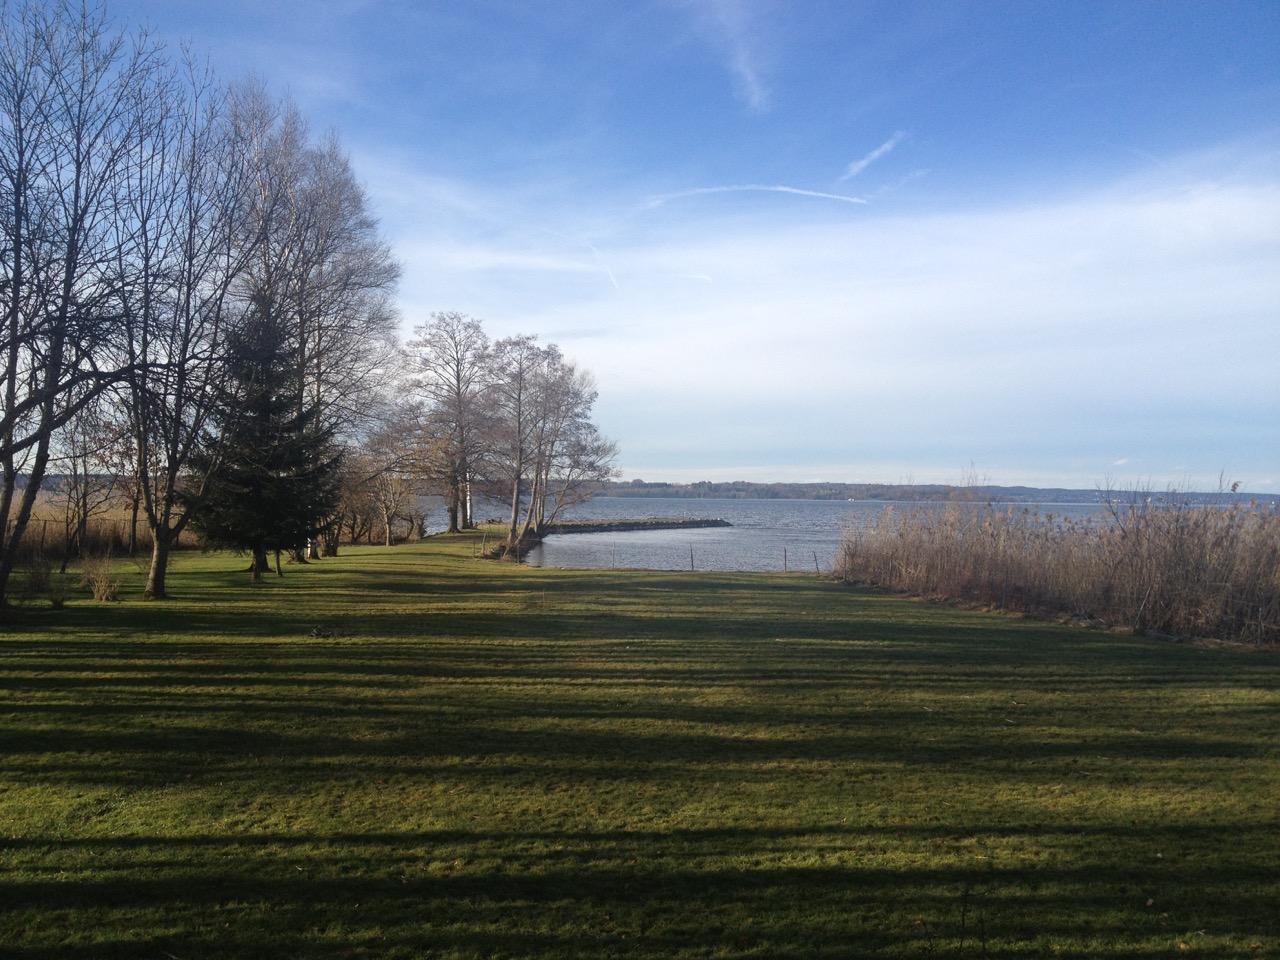 Seeanstoß zum Starnberger See